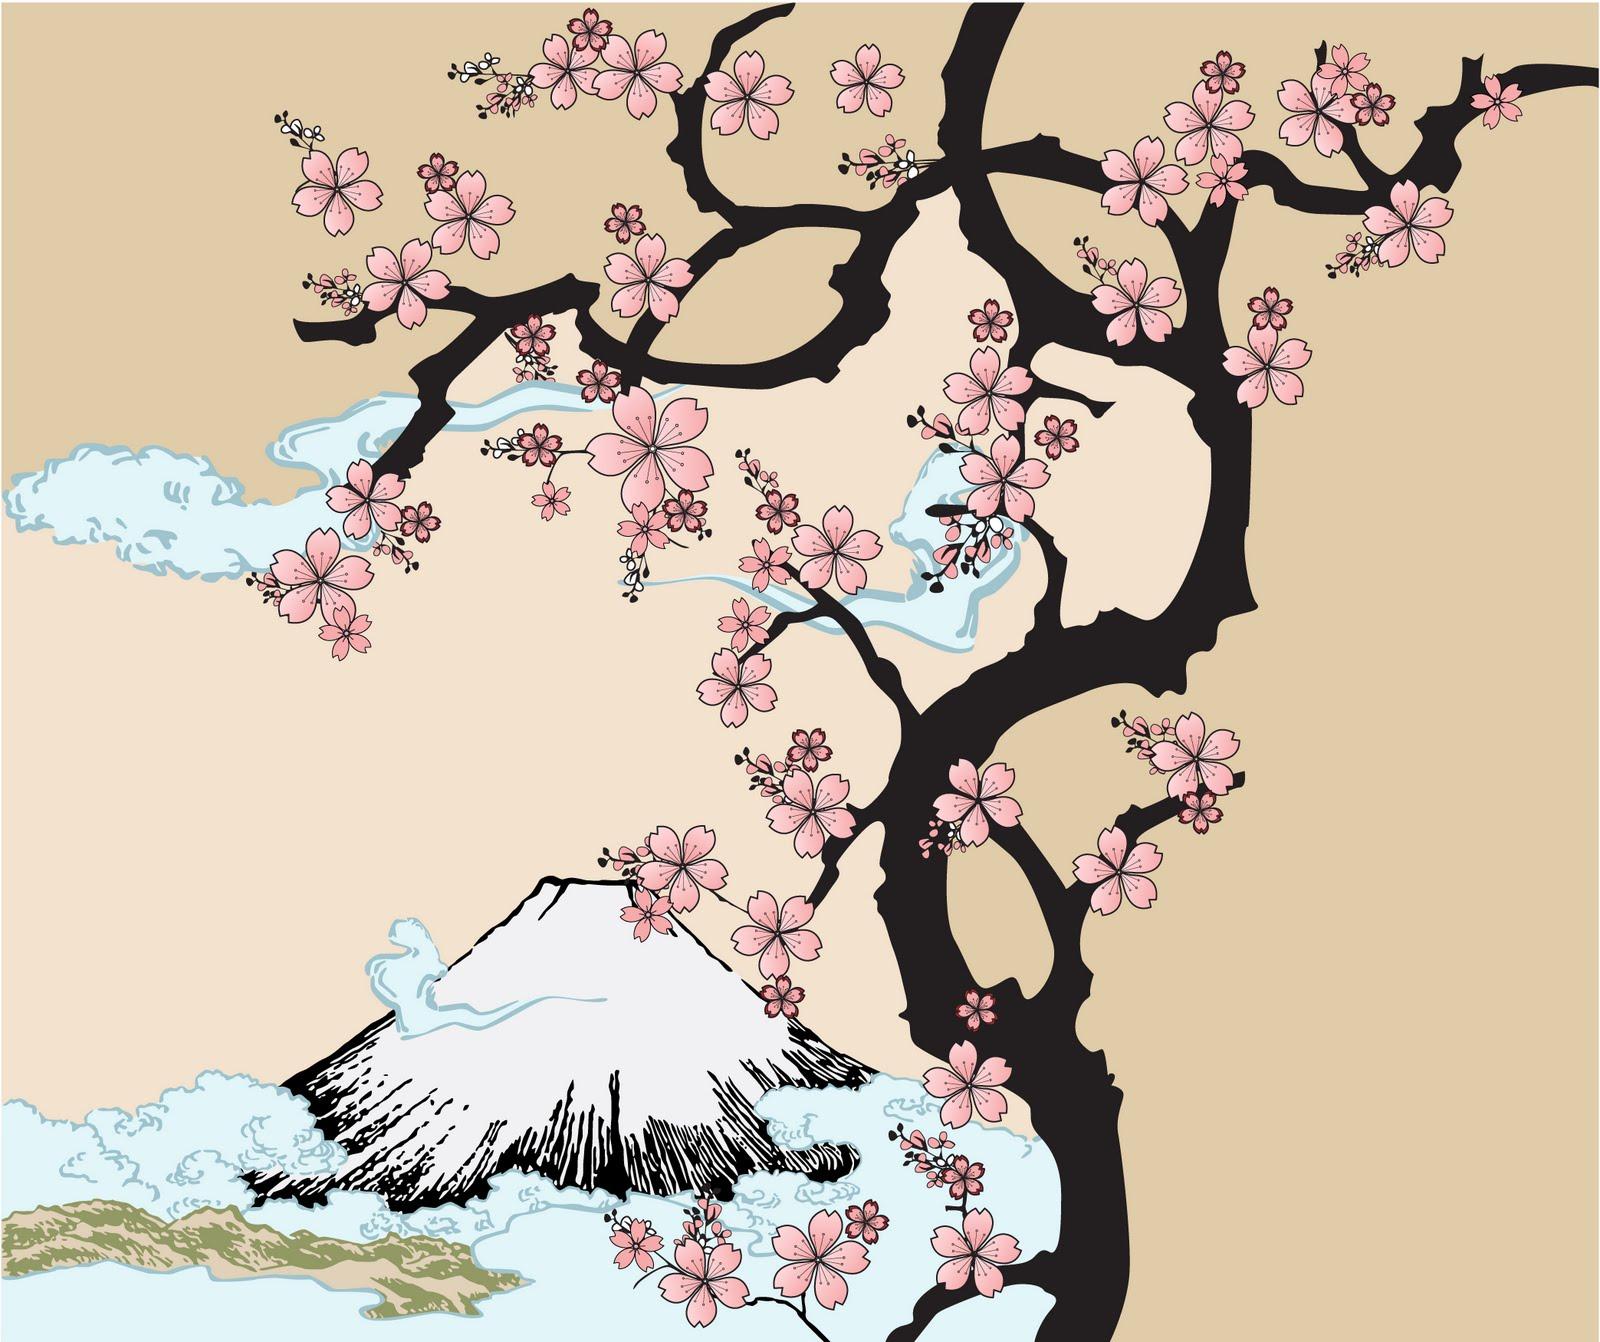 JAPANESE DESIGN: Why Japanese Design?